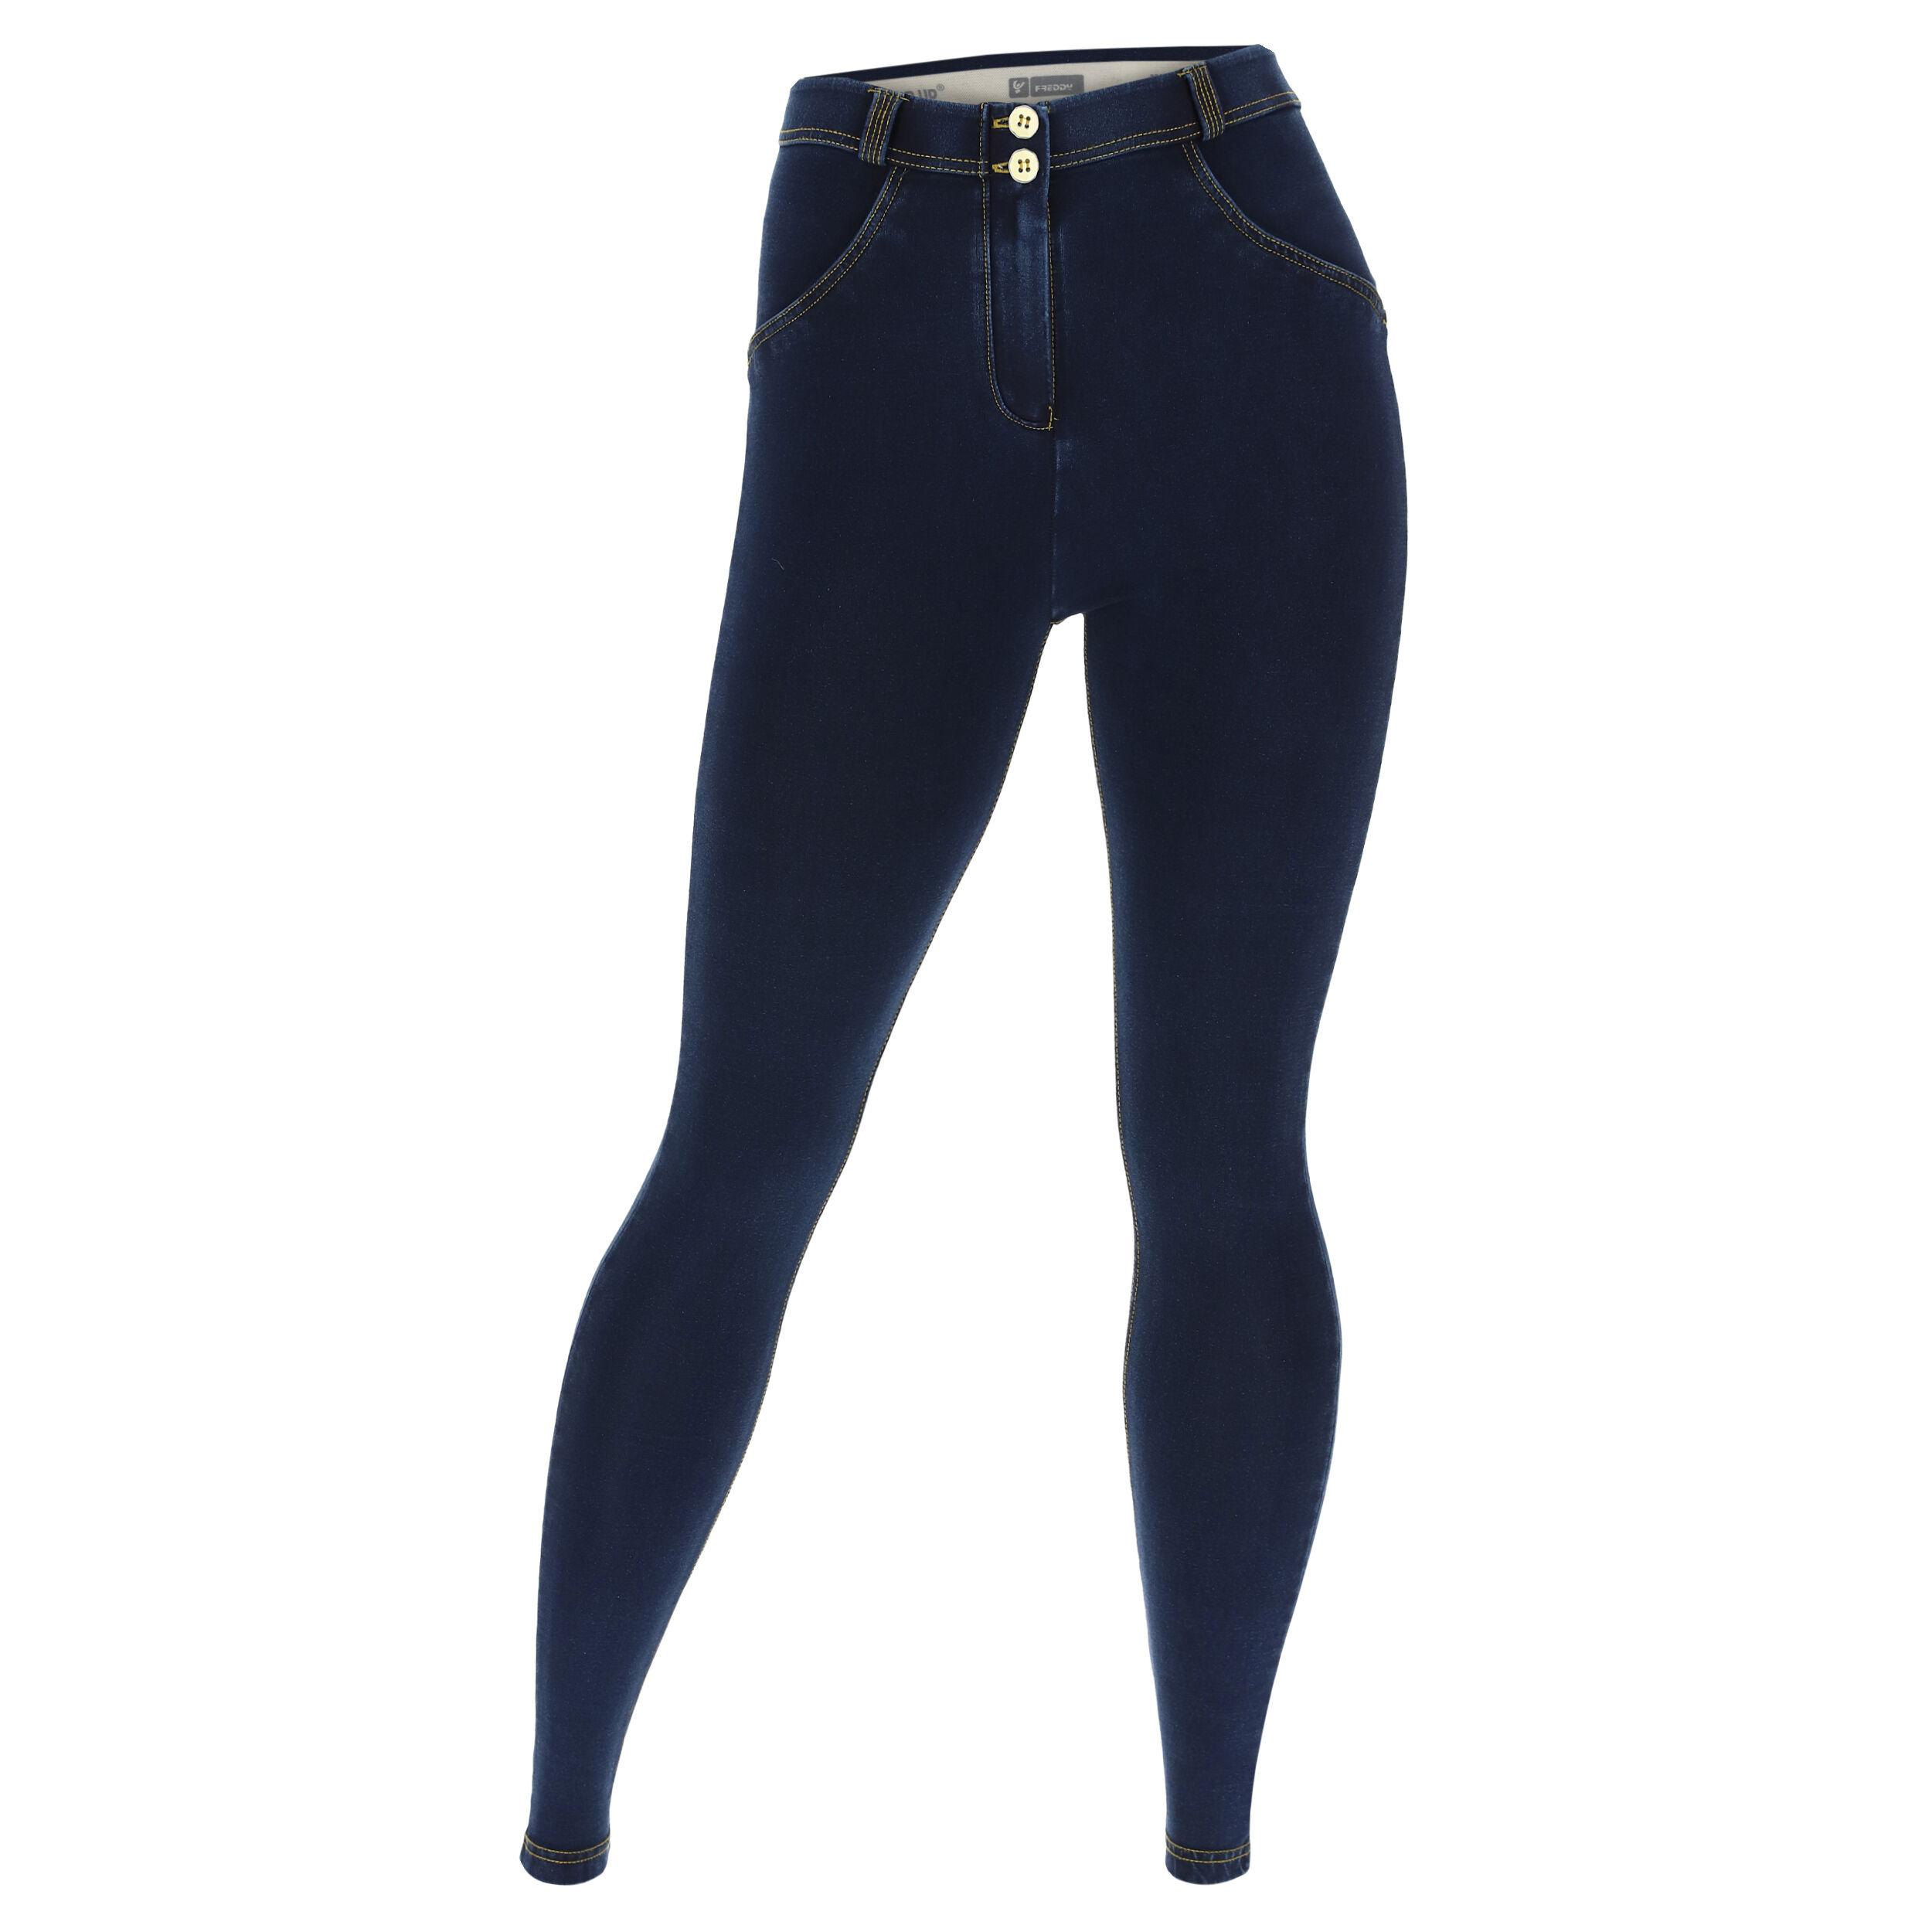 Freddy Jeggins push up WR.UP® vestibilità curvy denim scuro Jeans Scuro-Cuciture Gialle